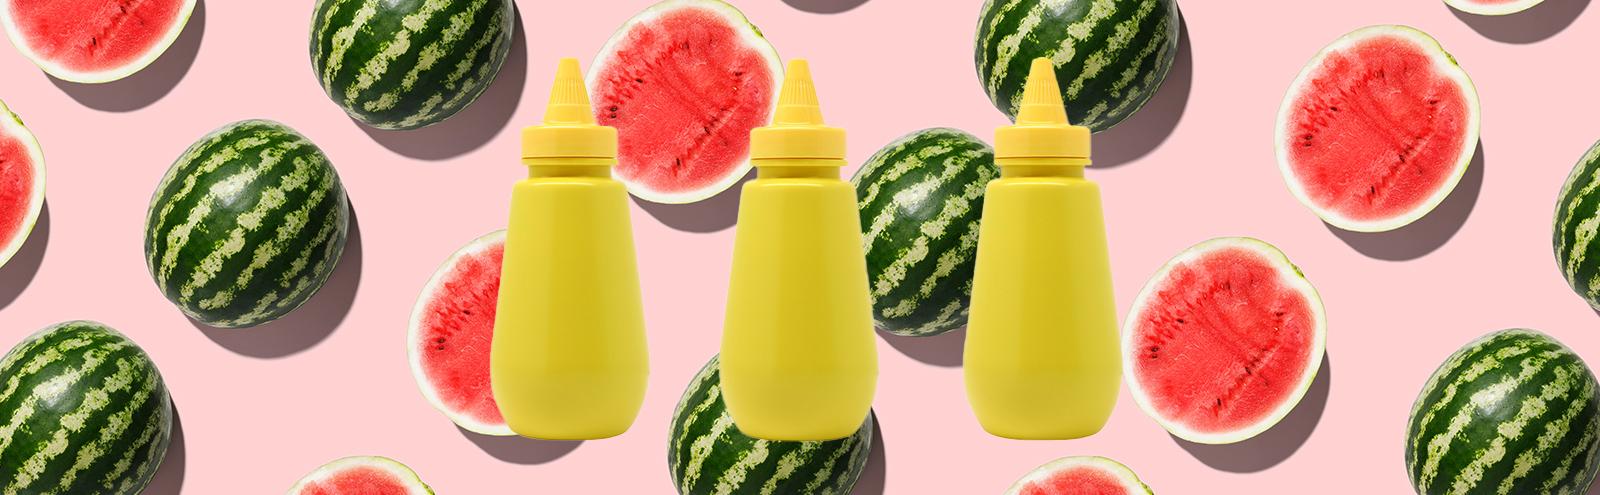 TikTok's Mustard-On-Watermelon Food Trend Is A Dark Omen For Summer '21